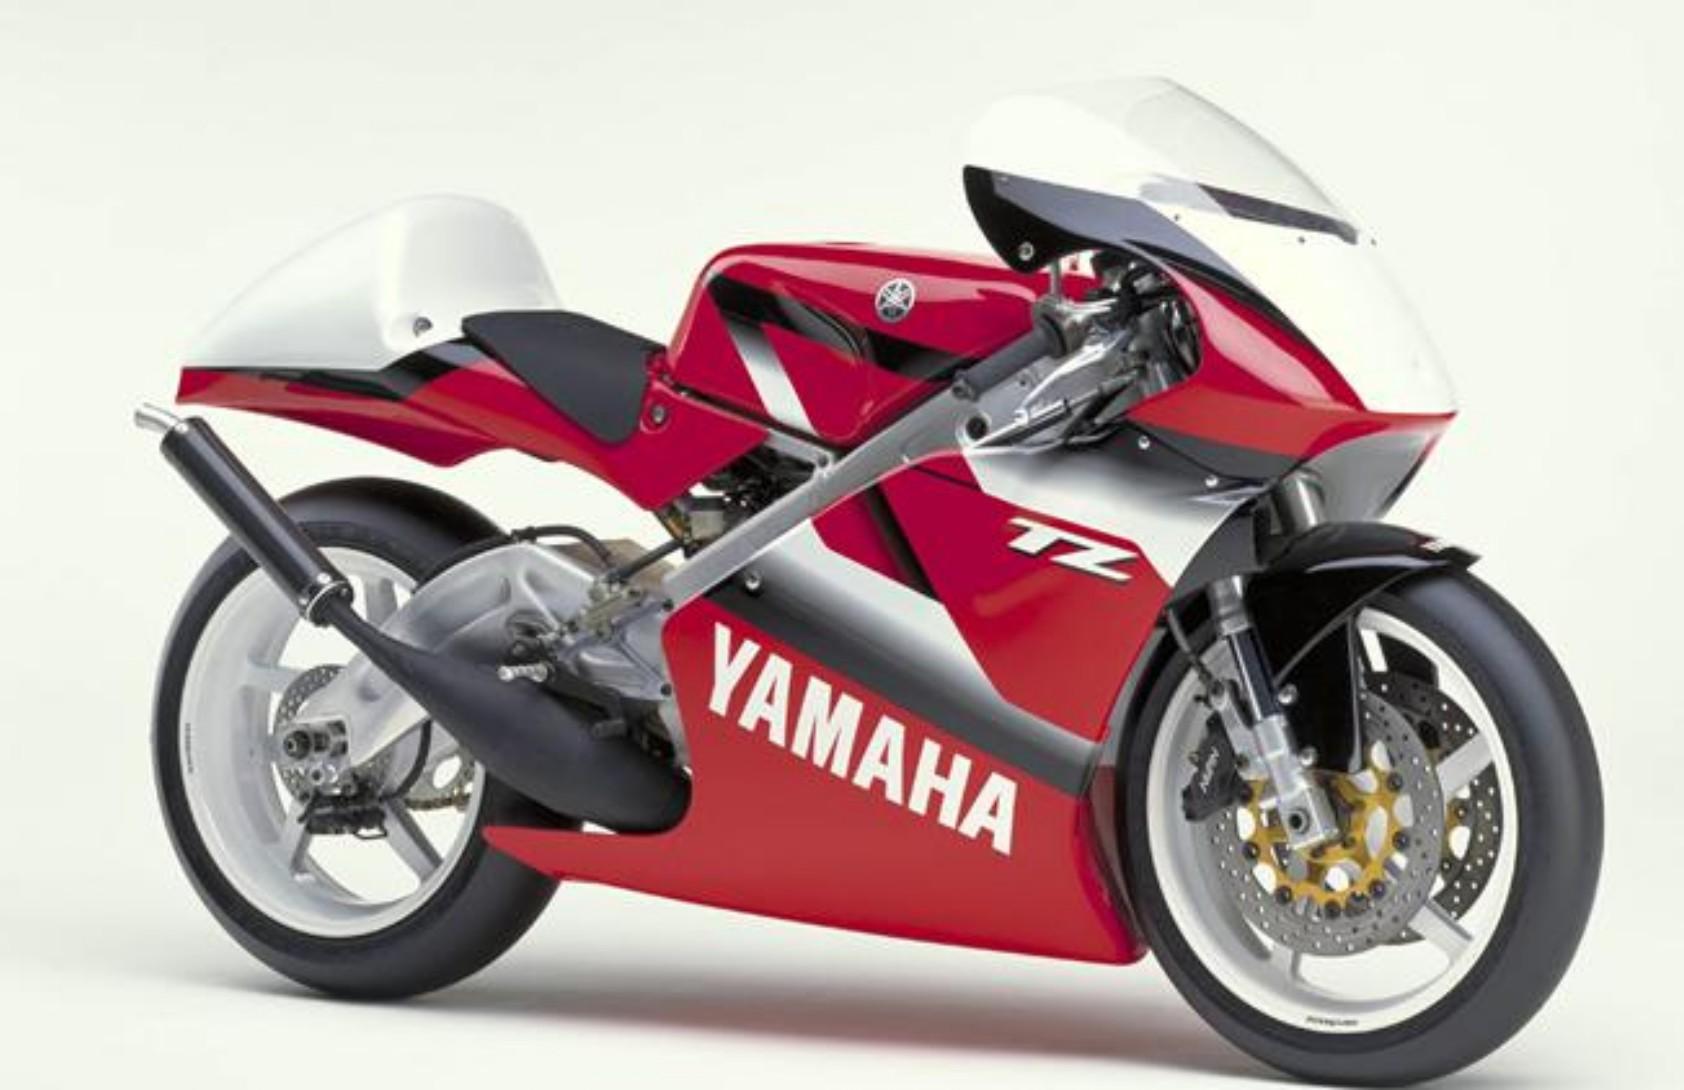 in big lines tzr250 3ma rh tzr3ma com yamaha tzr 250 3xv service manual Yamaha TZR 125